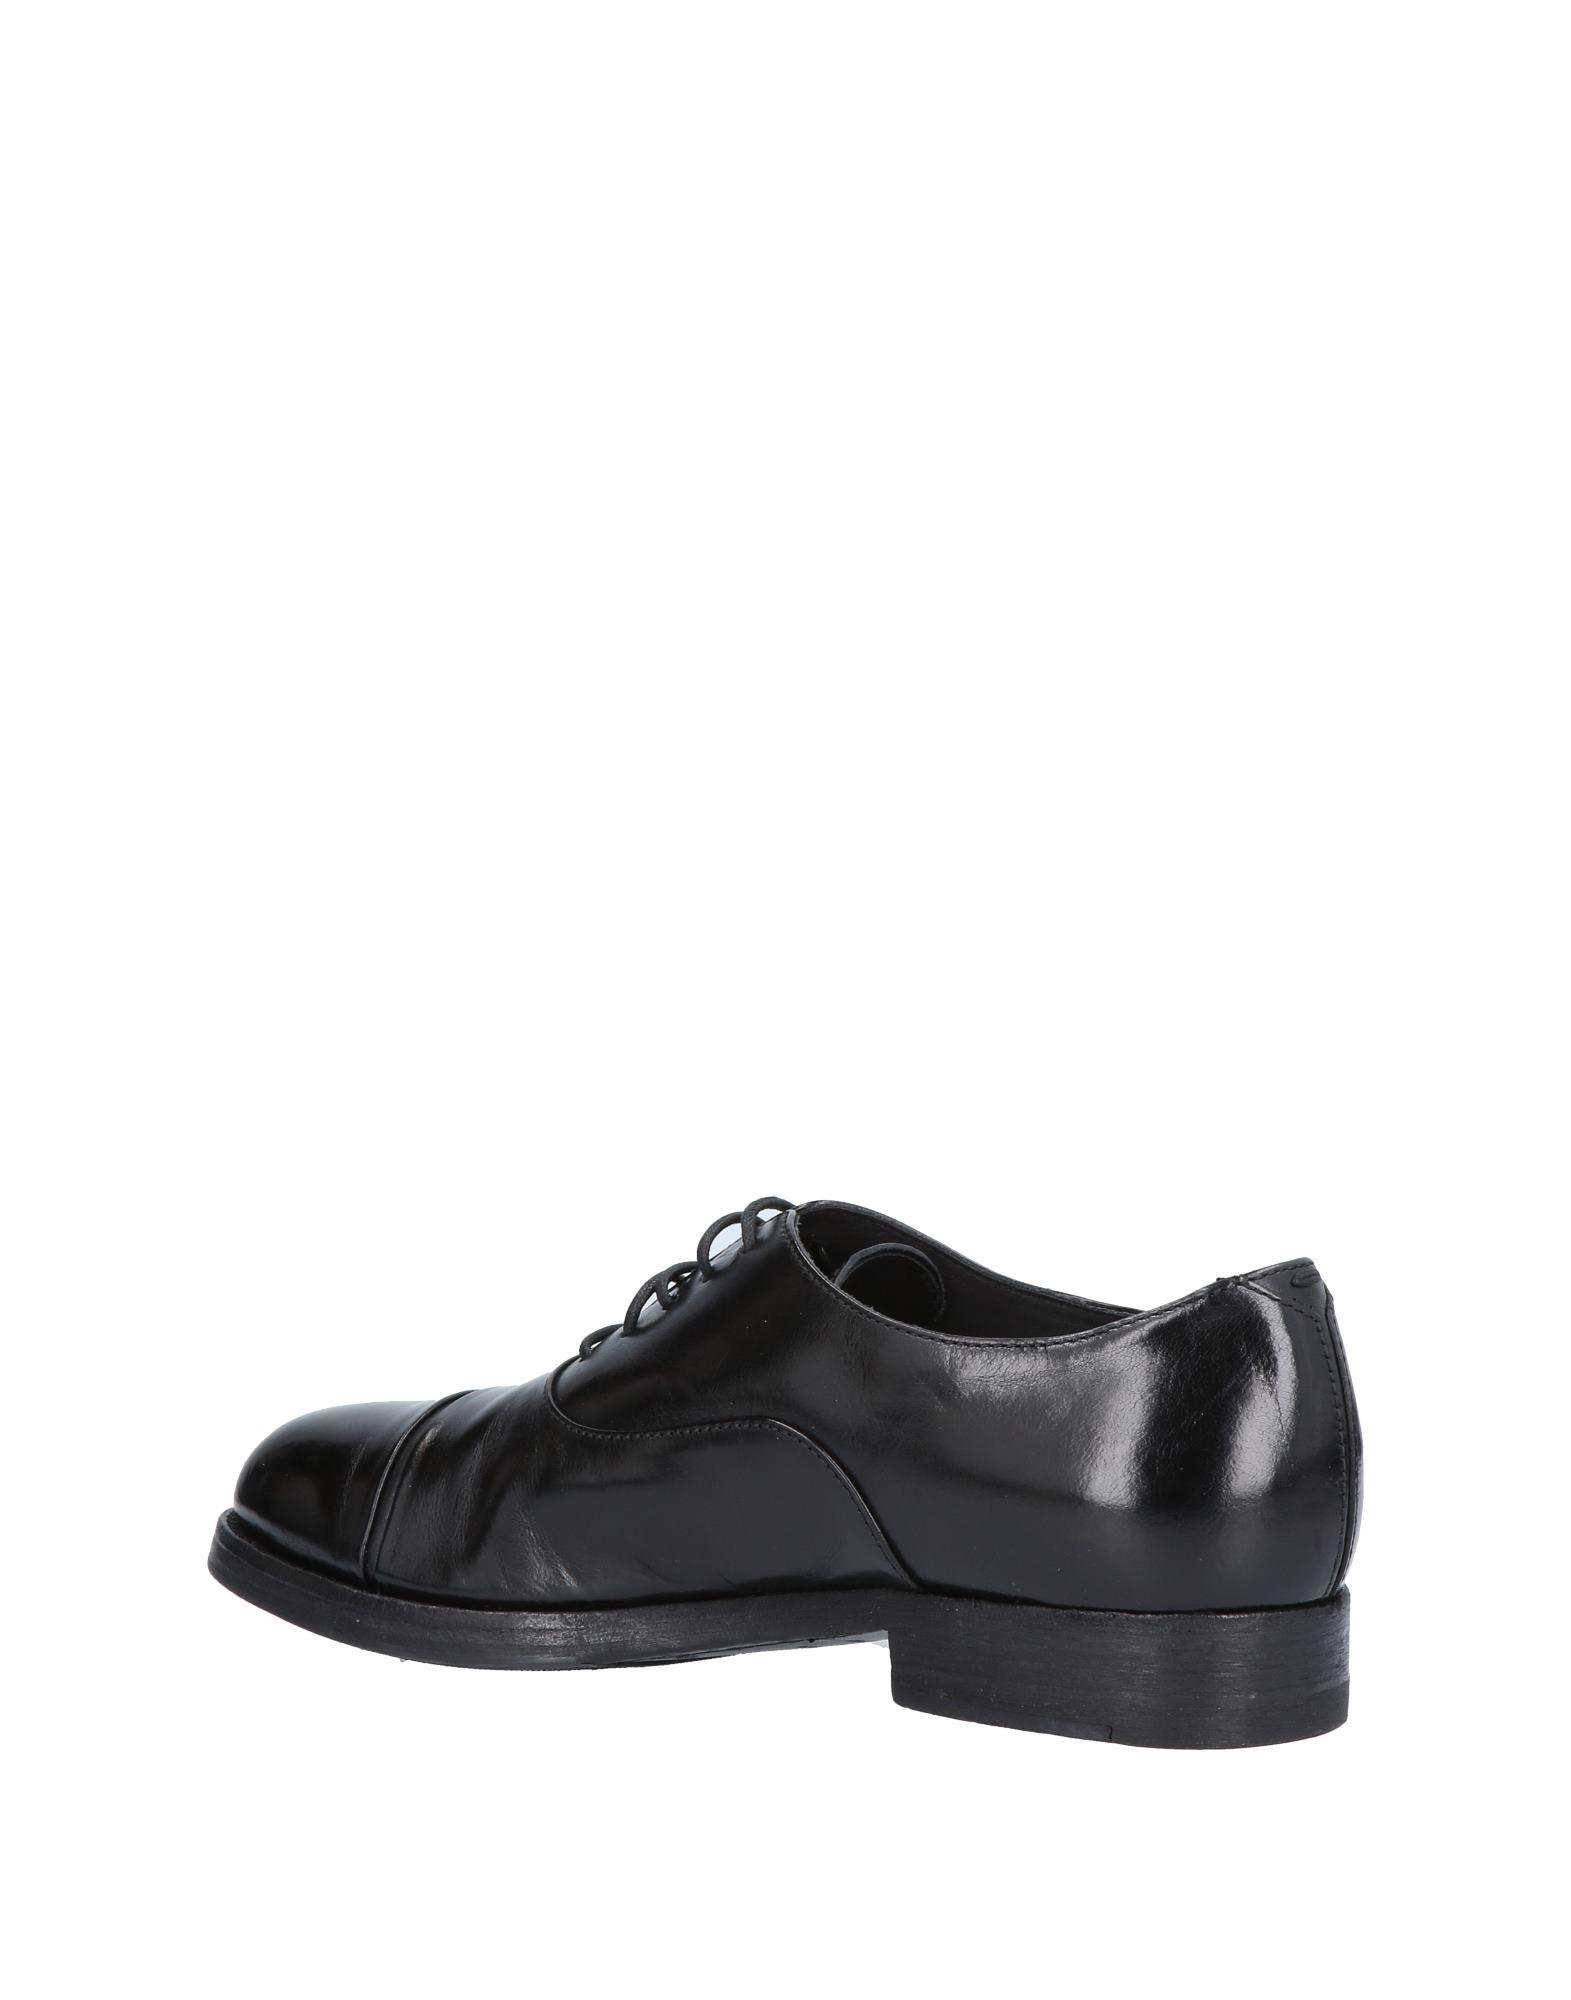 Stilvolle Pantanetti billige Schuhe Pantanetti Stilvolle Schnürschuhe Damen  11482132WH 159ce4